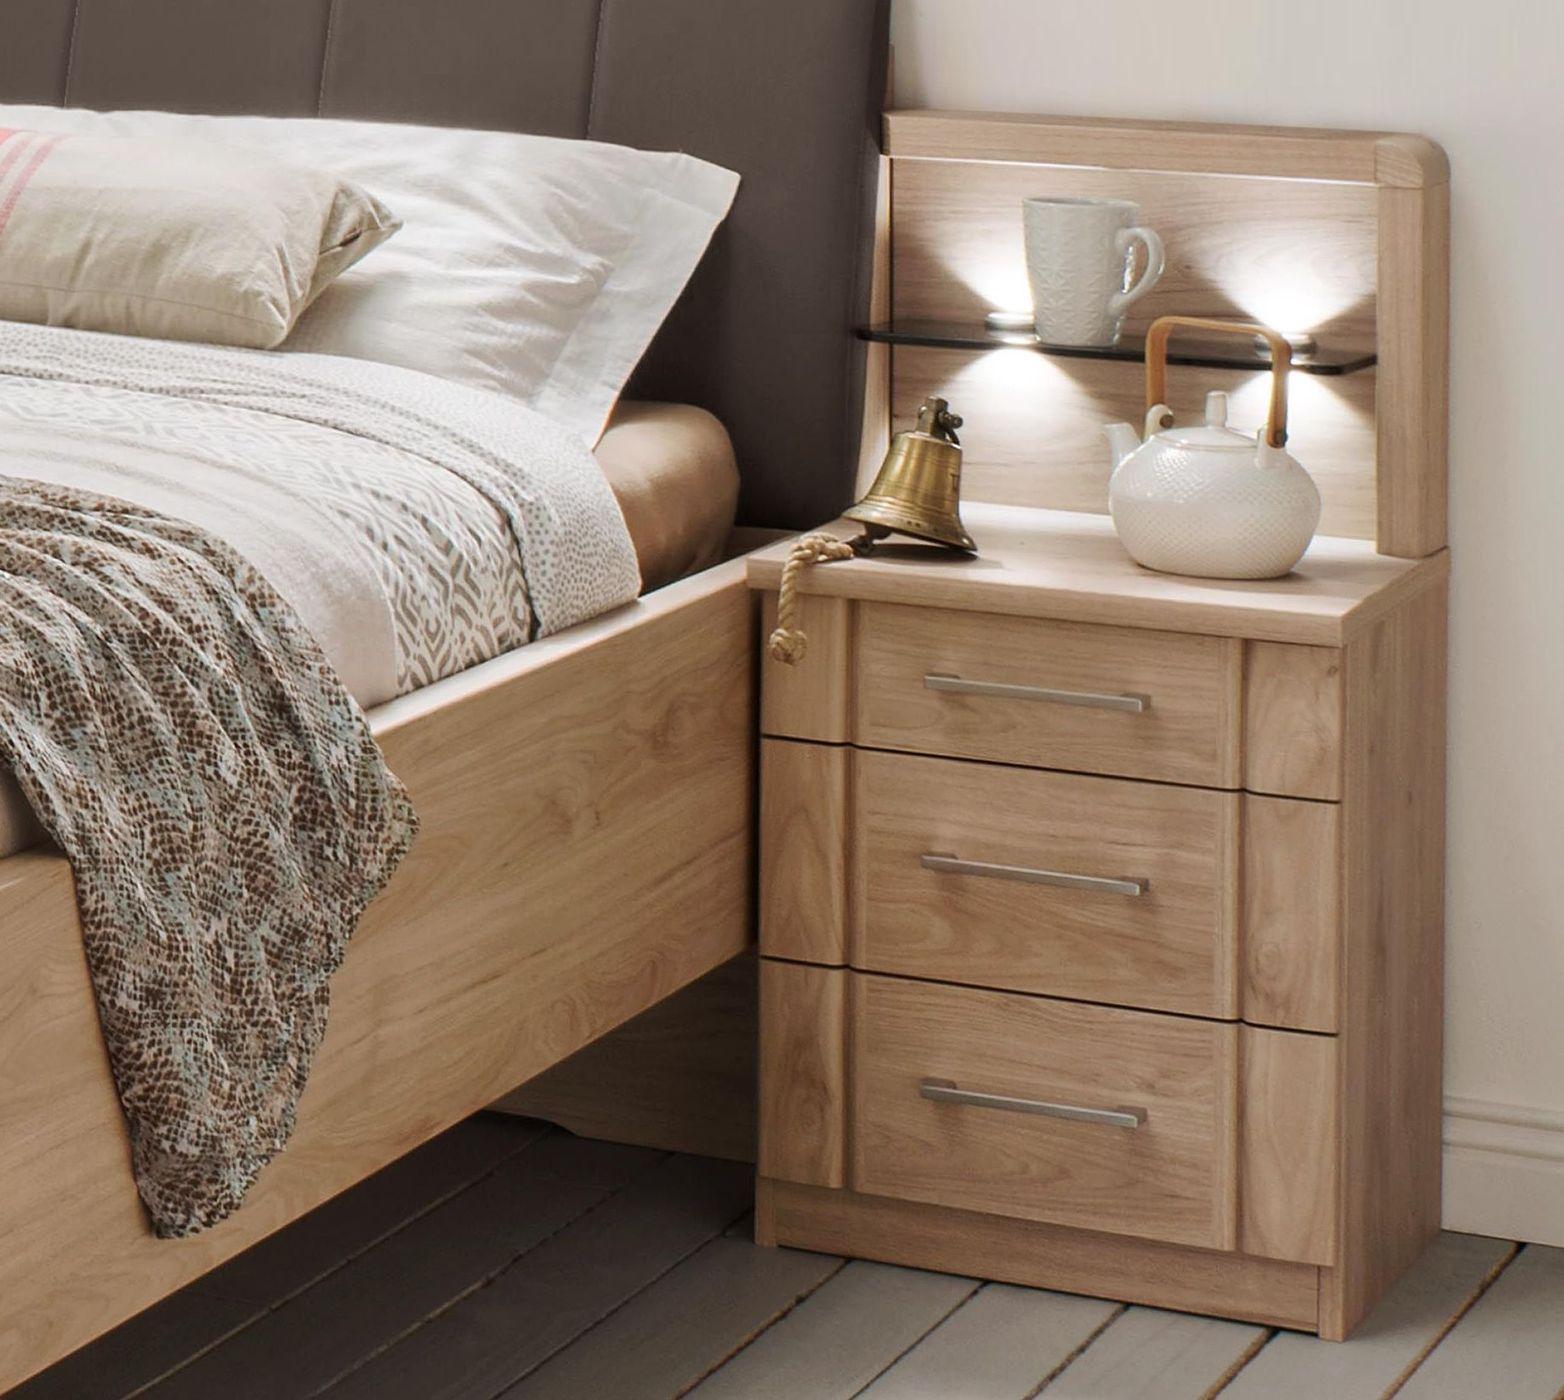 schmaler nachttisch beautiful medium size of schmale nachttische schmales sehr schmaler. Black Bedroom Furniture Sets. Home Design Ideas